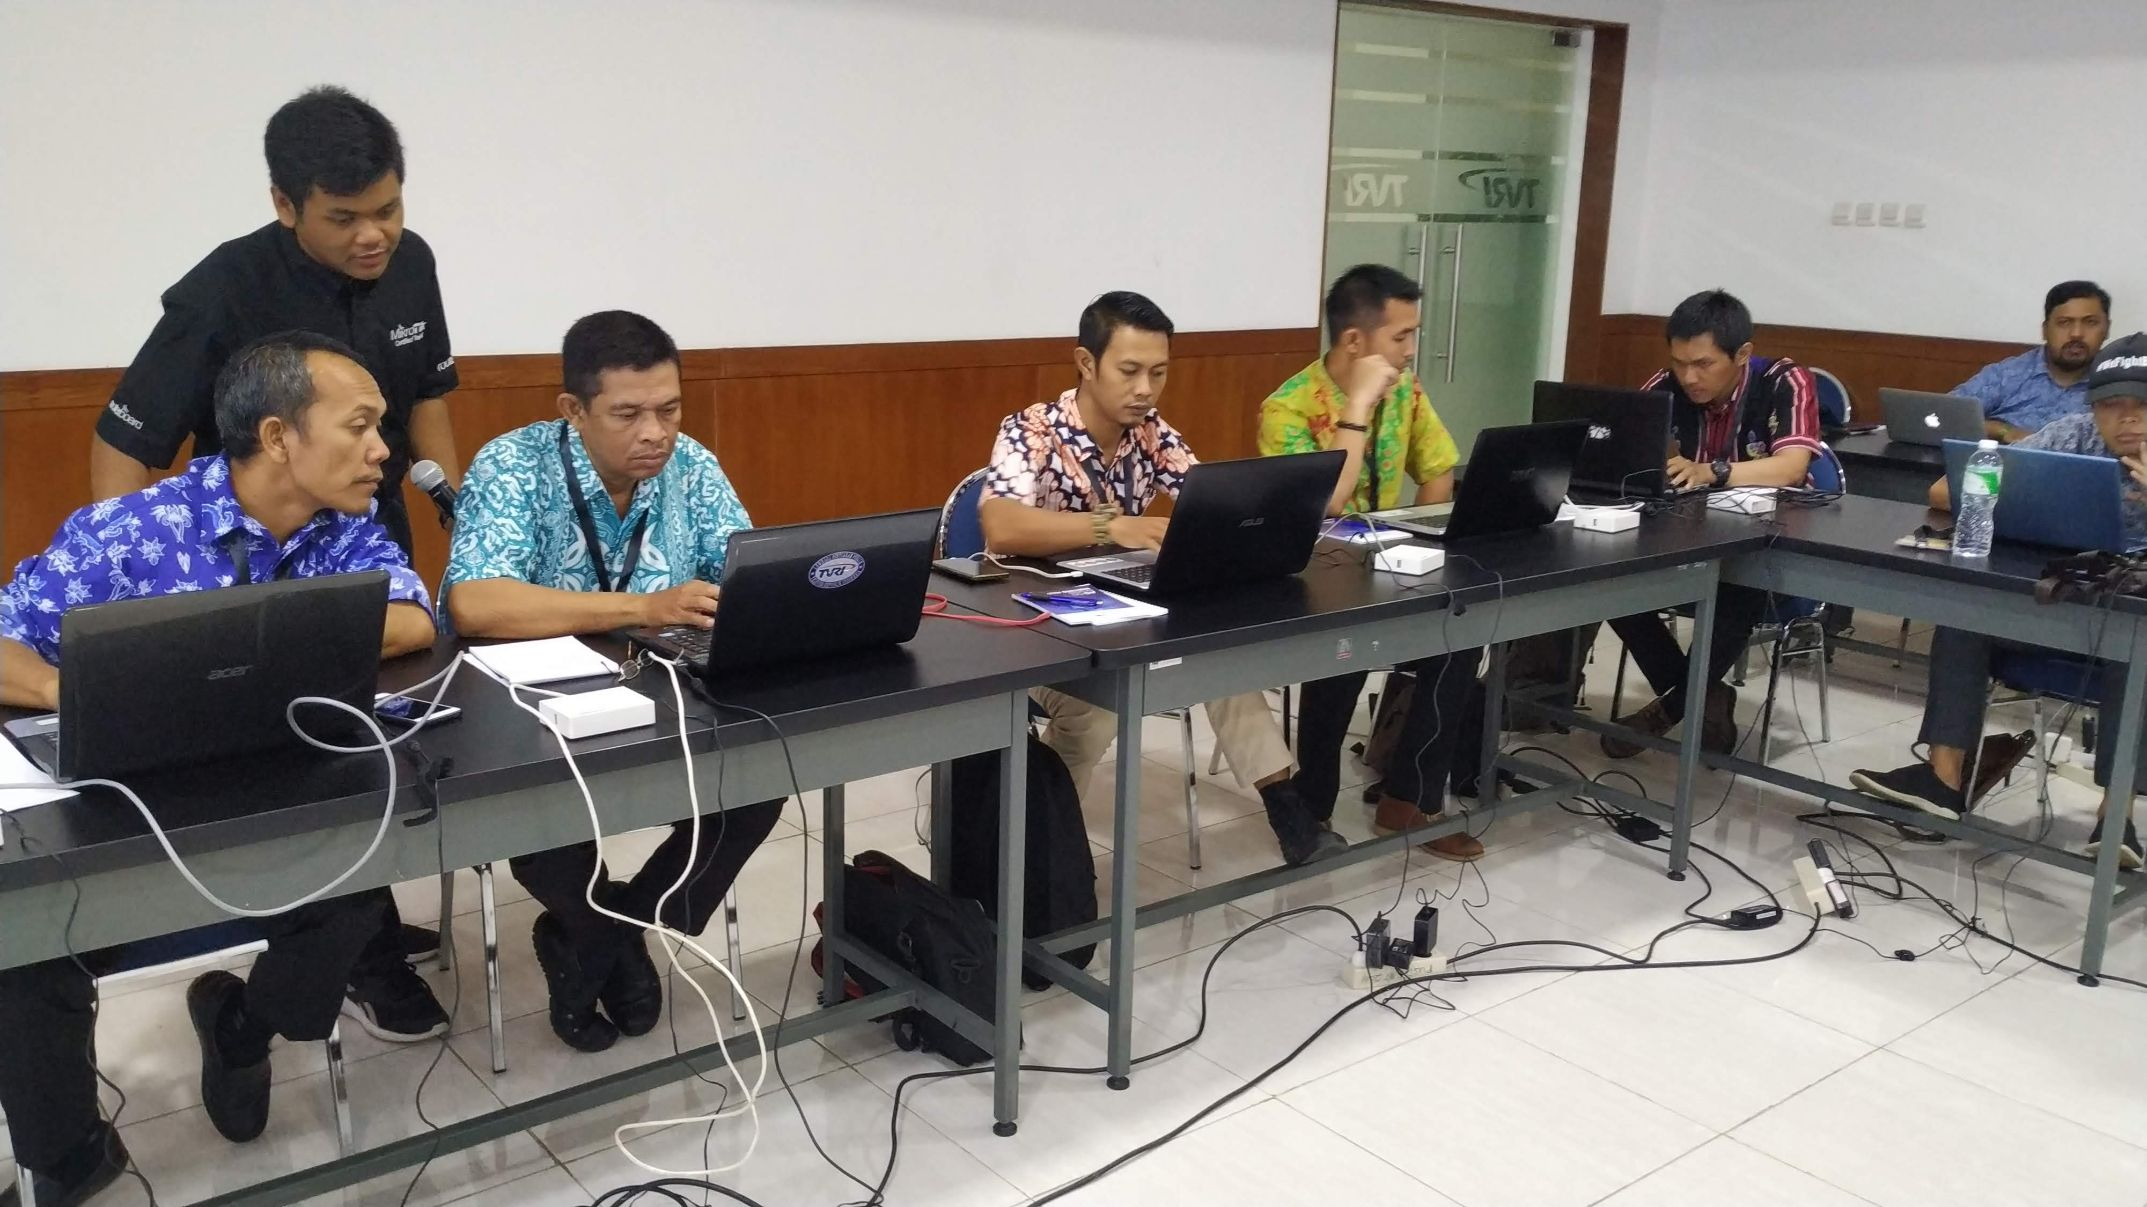 belajar, mikrotik, sertifikasi, training, IMG_20190312_092440